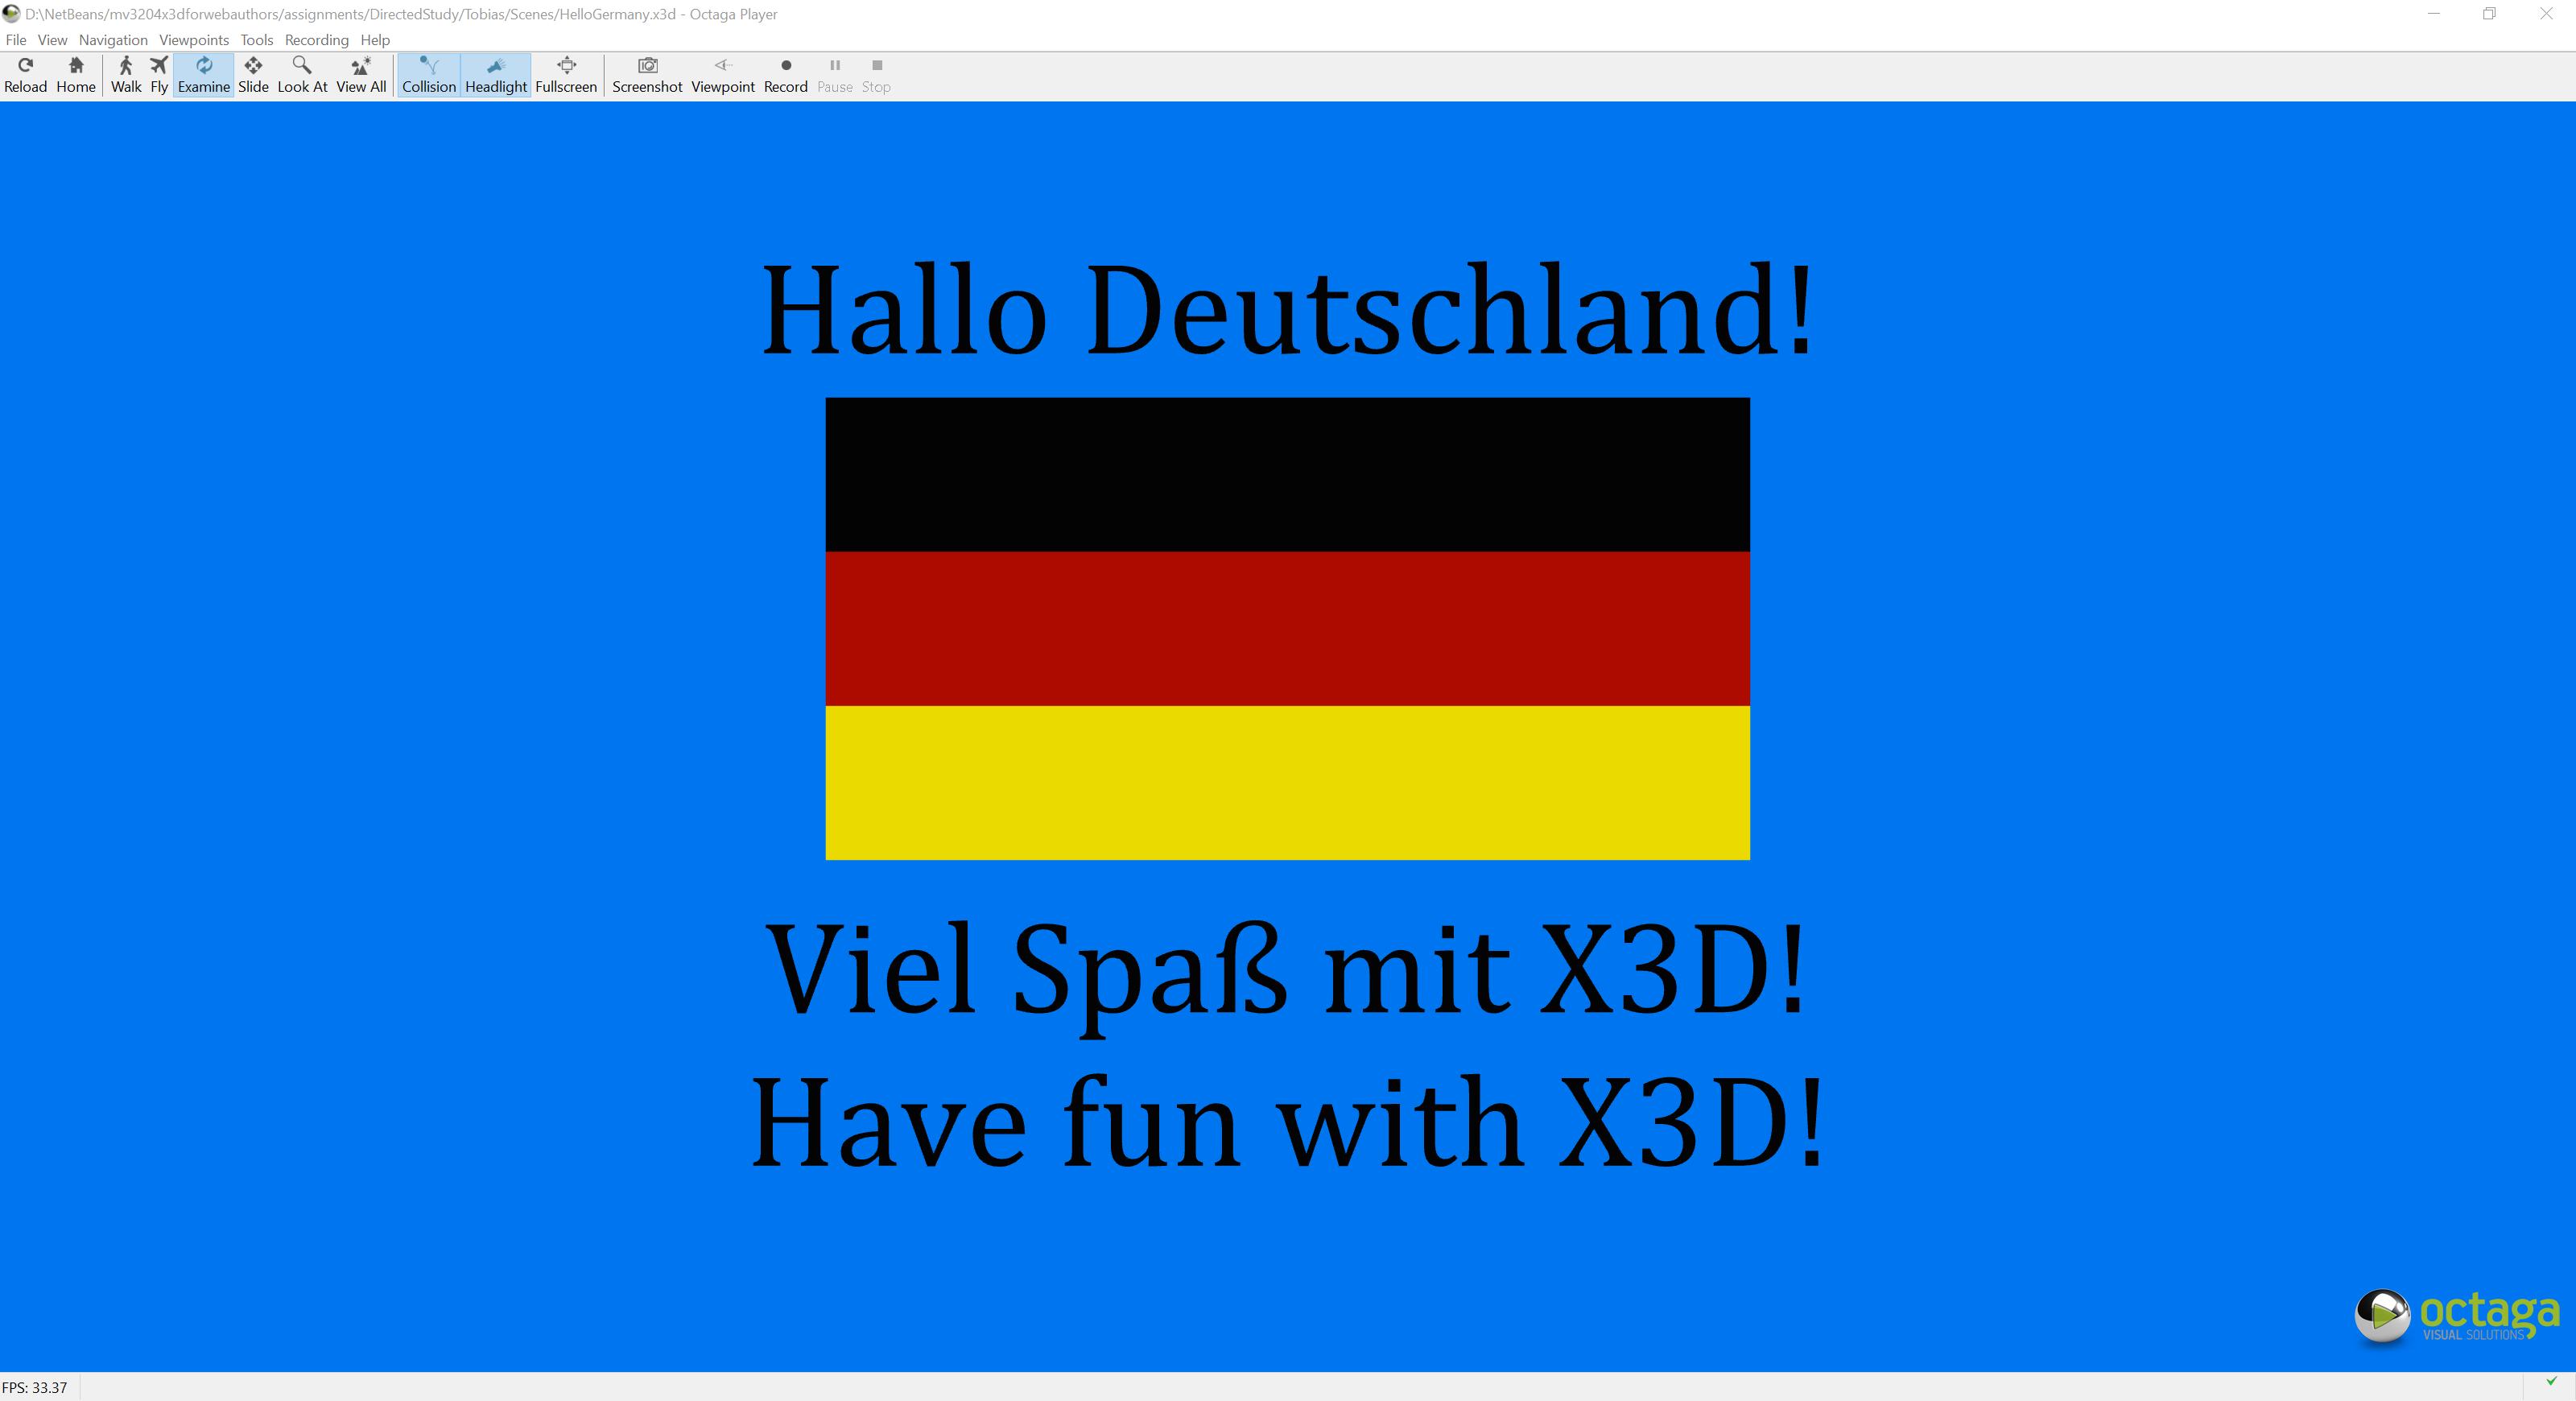 BrennenstuhlTobias/Screenshots/Player/Hello Germany/HelloGermany.Octaga.png